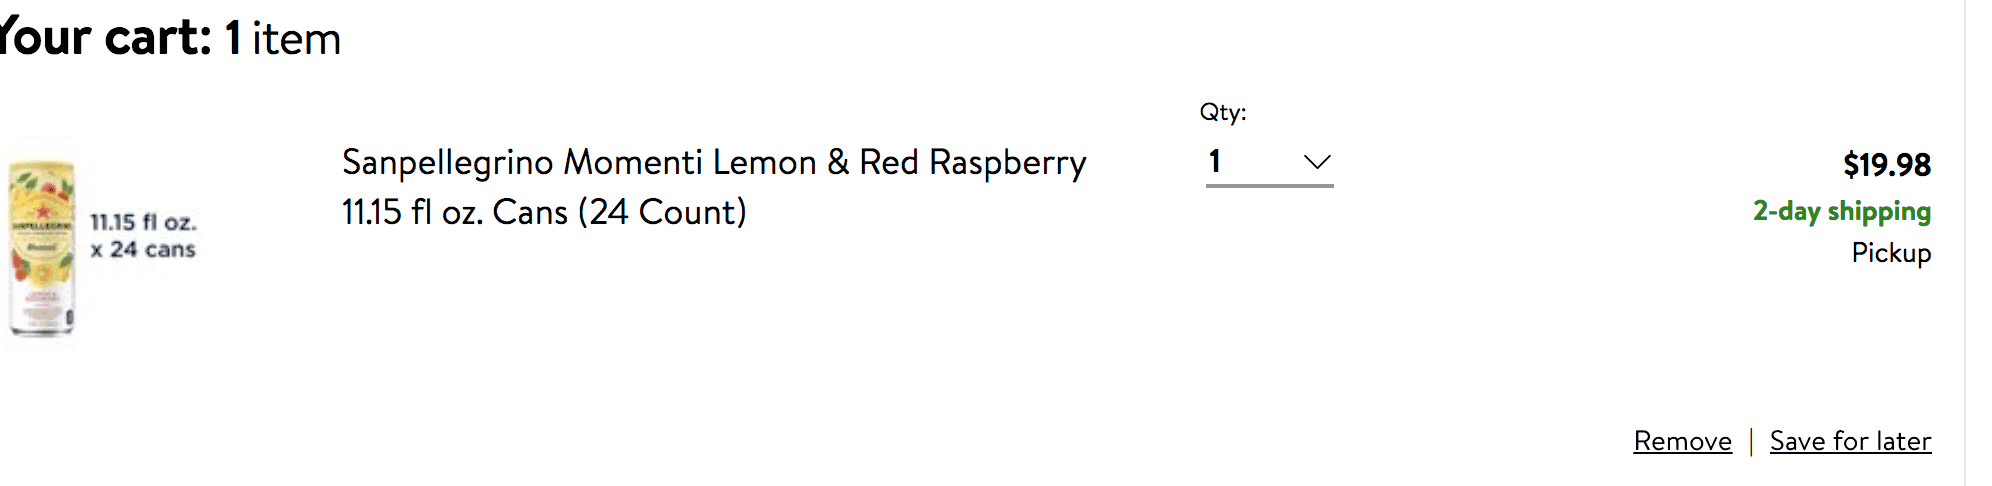 A screen shot of an order of SANPELLEGRINO® Momenti Lemon & Red Raspberry